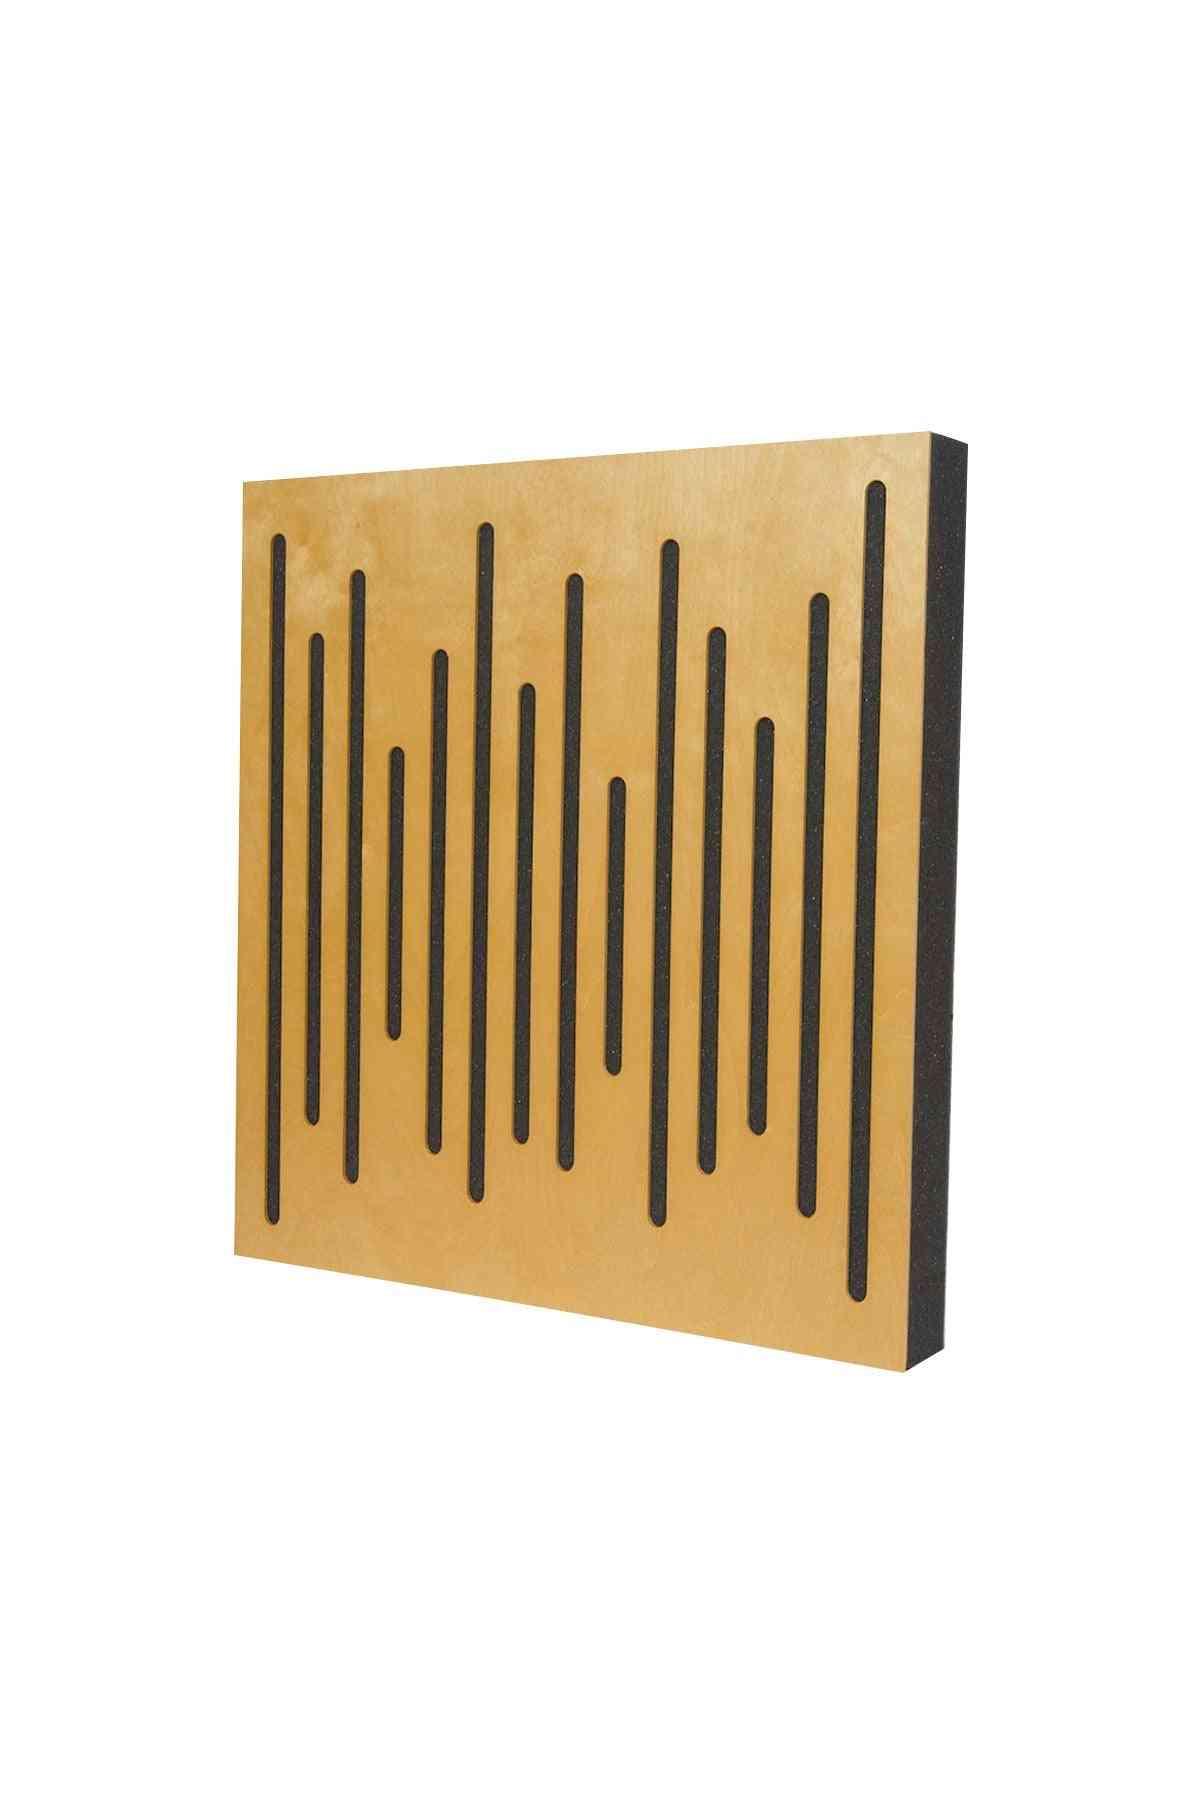 Acoustic Wood Diffuser, Panel Music Studio, Efficient Solution Wall Decor Design Handmade